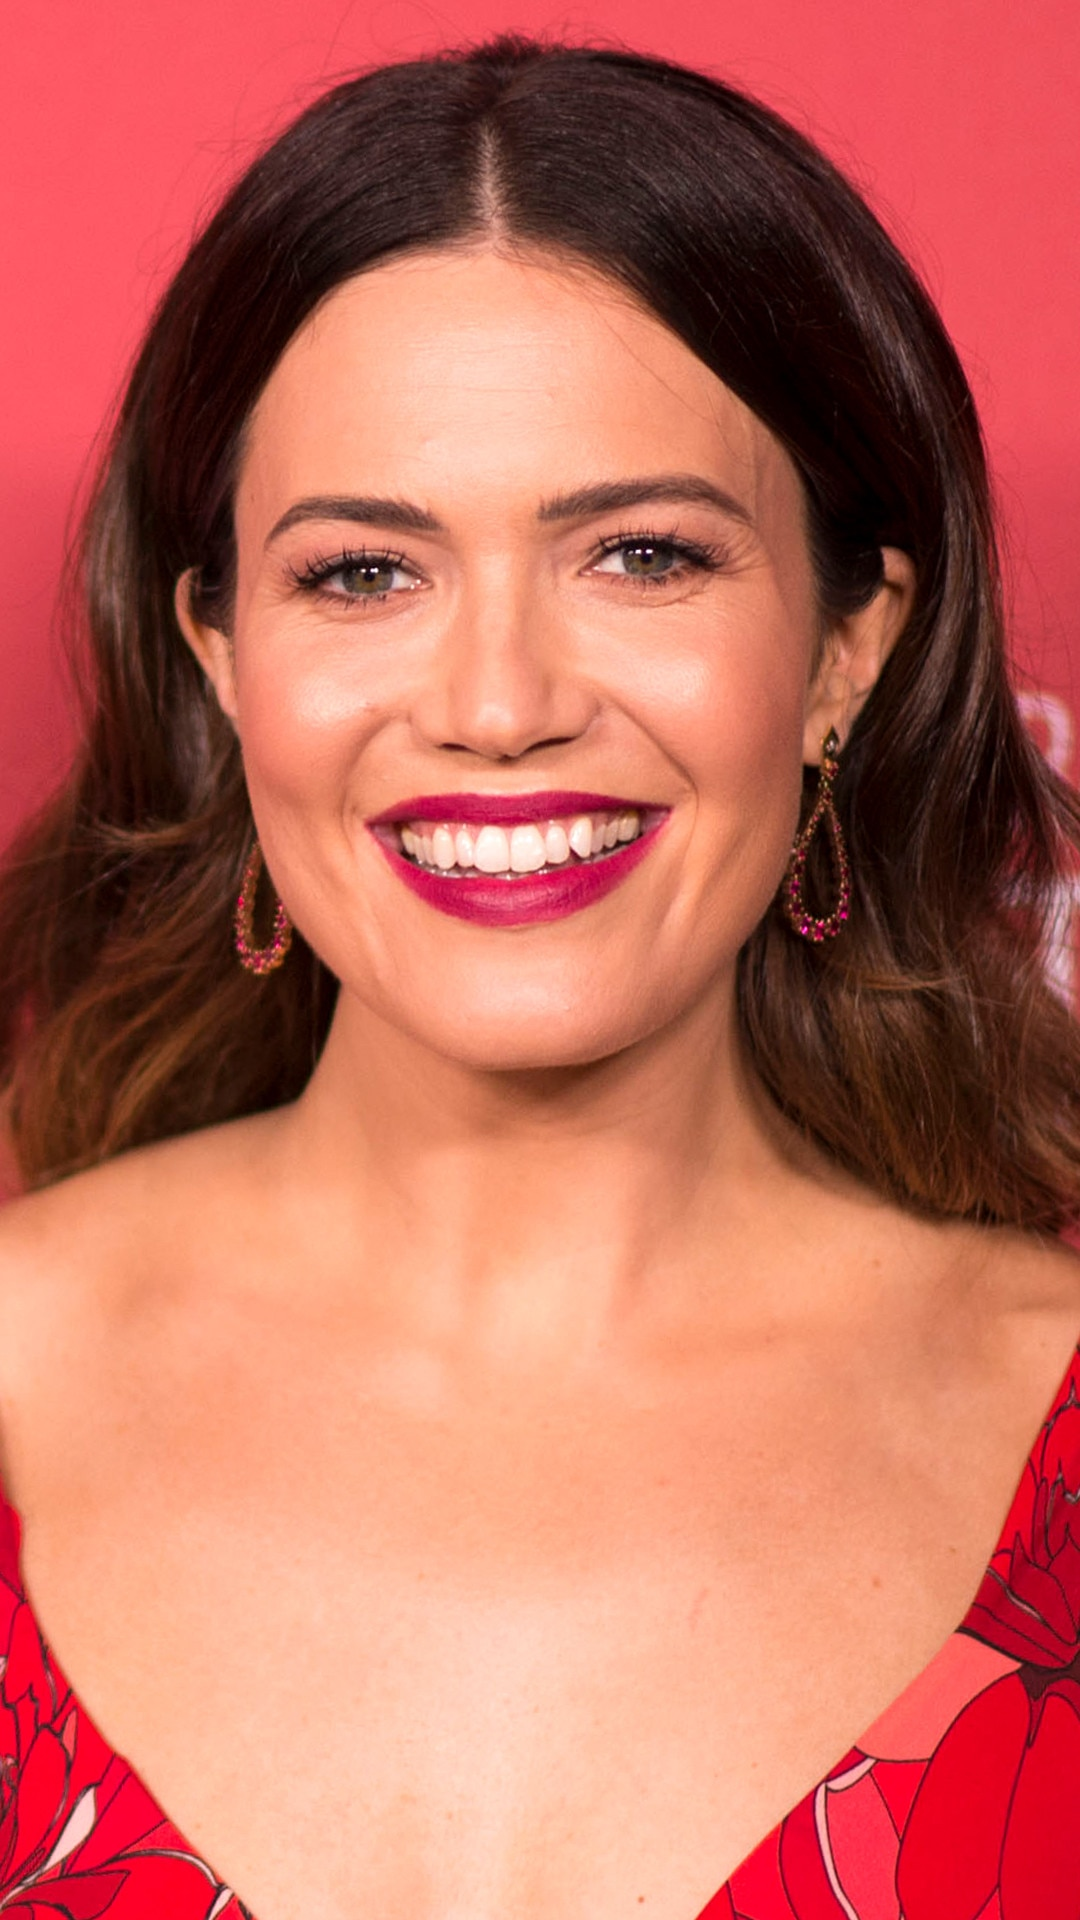 ESC: Style Awards 2017, Mandy Moore